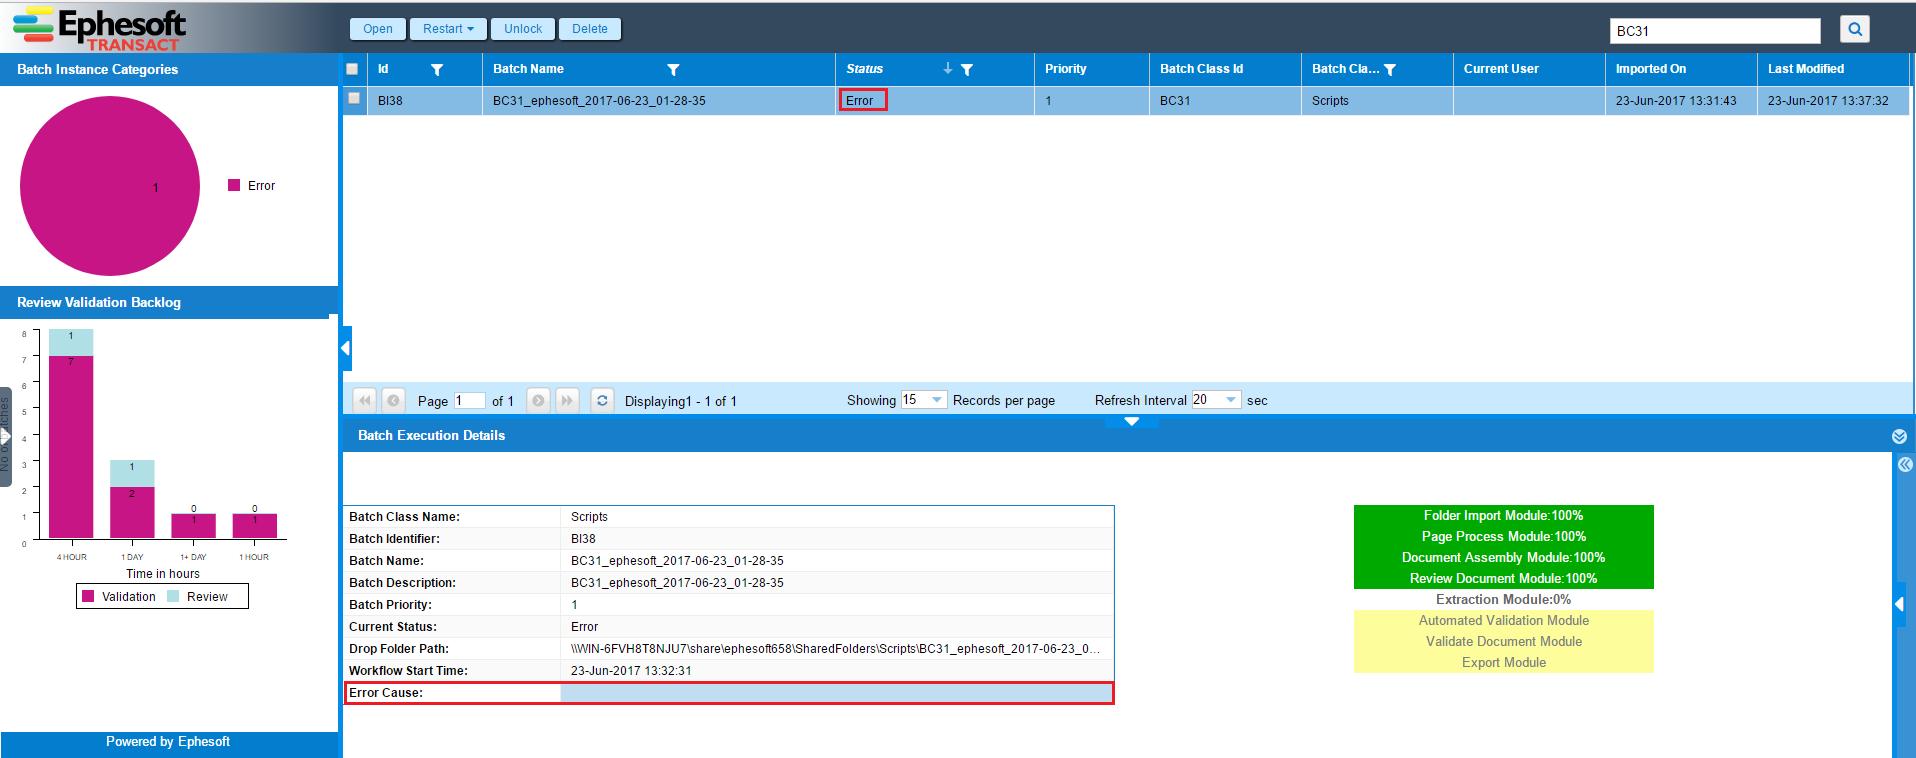 C:\Users\Ephesoft\AppData\Local\Microsoft\Windows\INetCache\Content.Word\error4.png